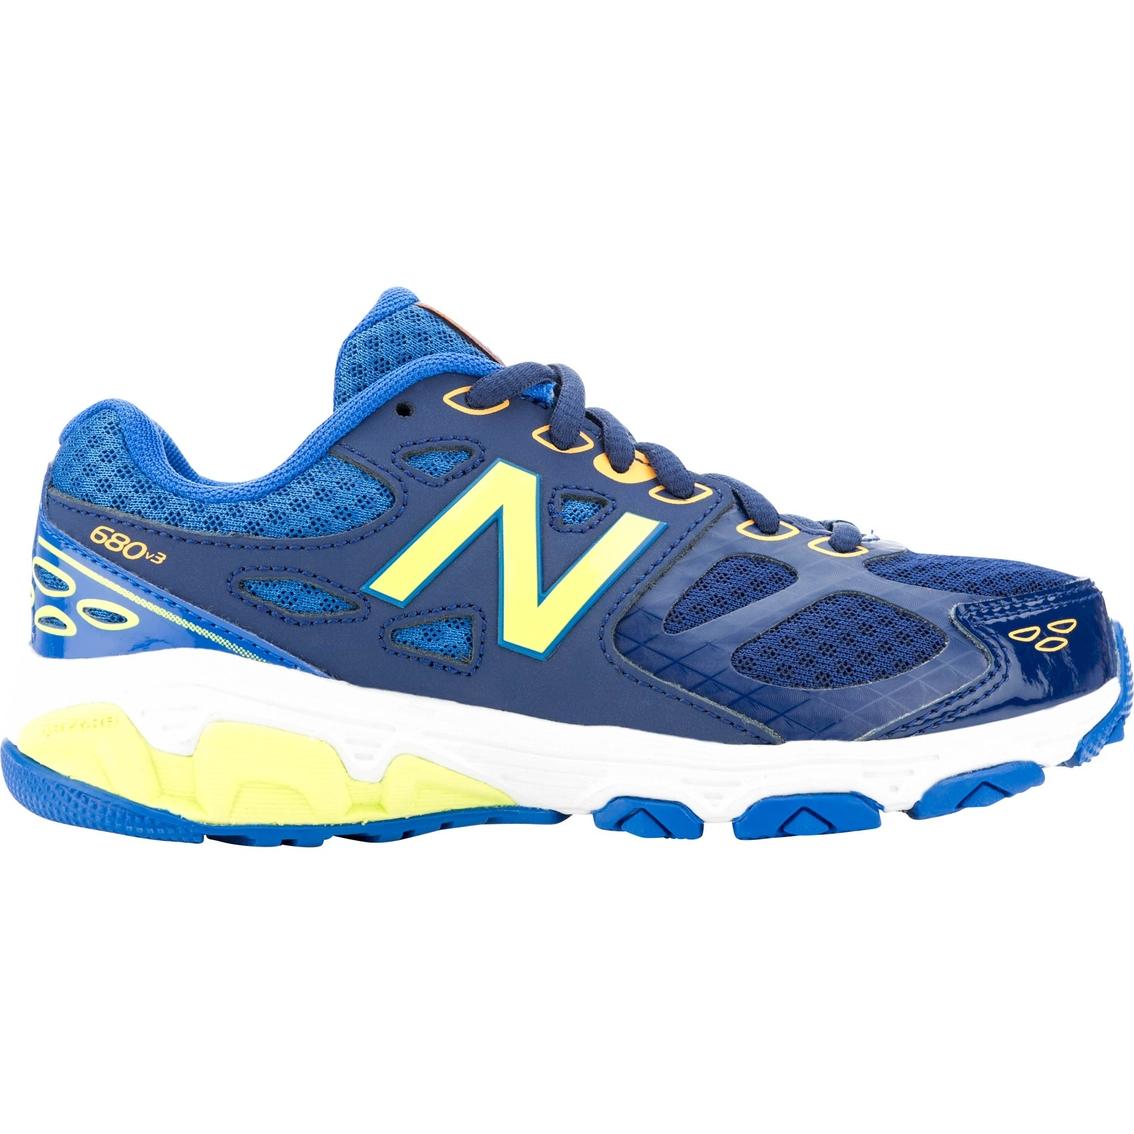 Couleurs variées 6a491 6abc4 New Balance Boys Kr680bty Running Shoes   Children's ...